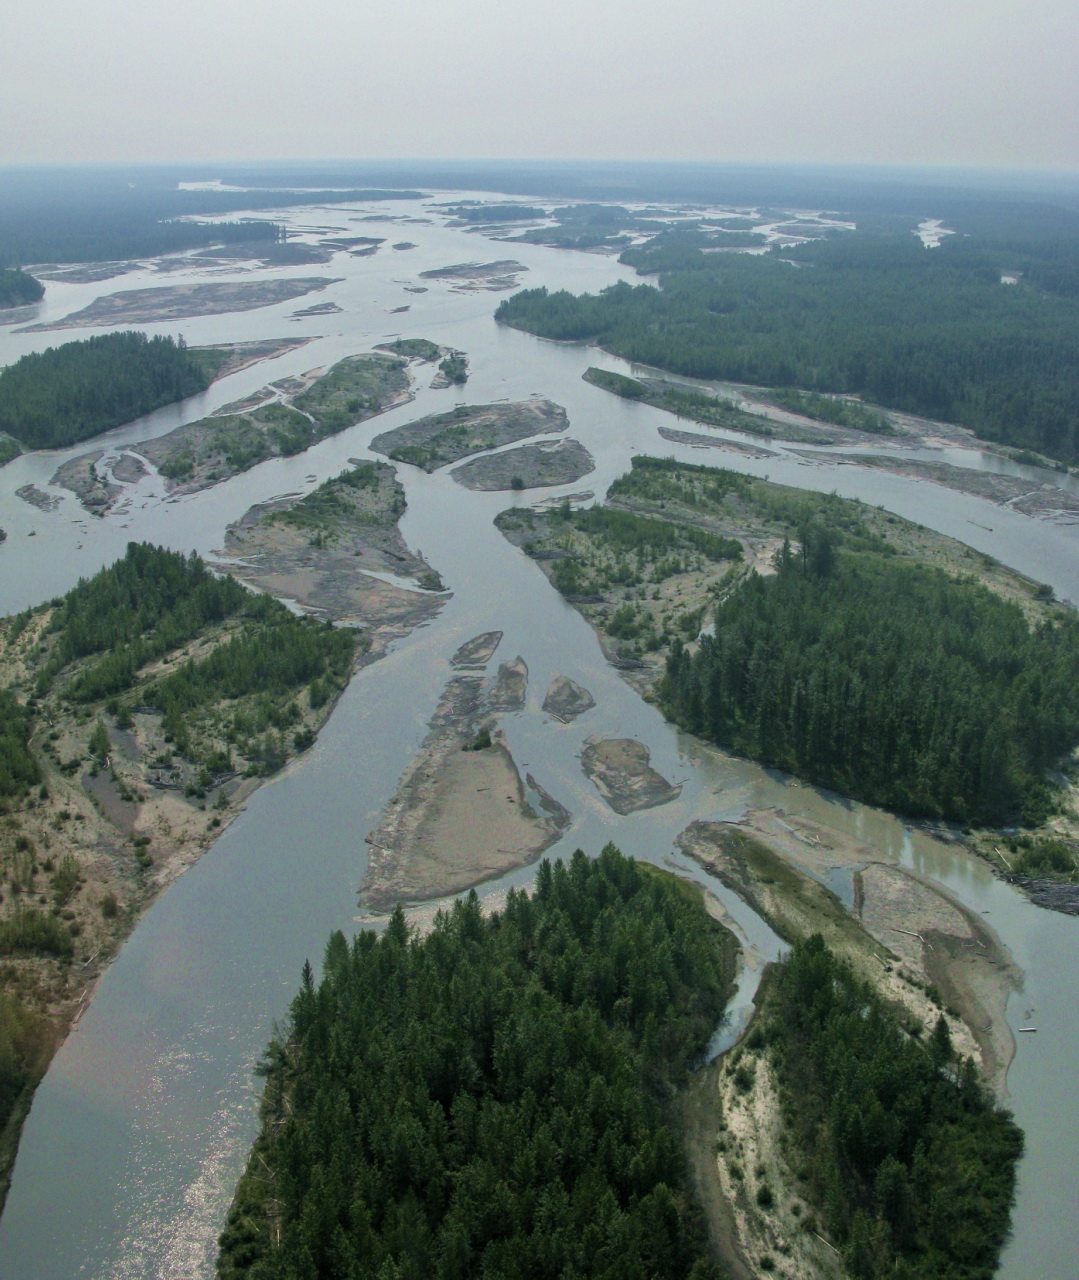 Fichier:3 Rivers Joining at Talkeetna, Alaska.jpg — Wikipédia